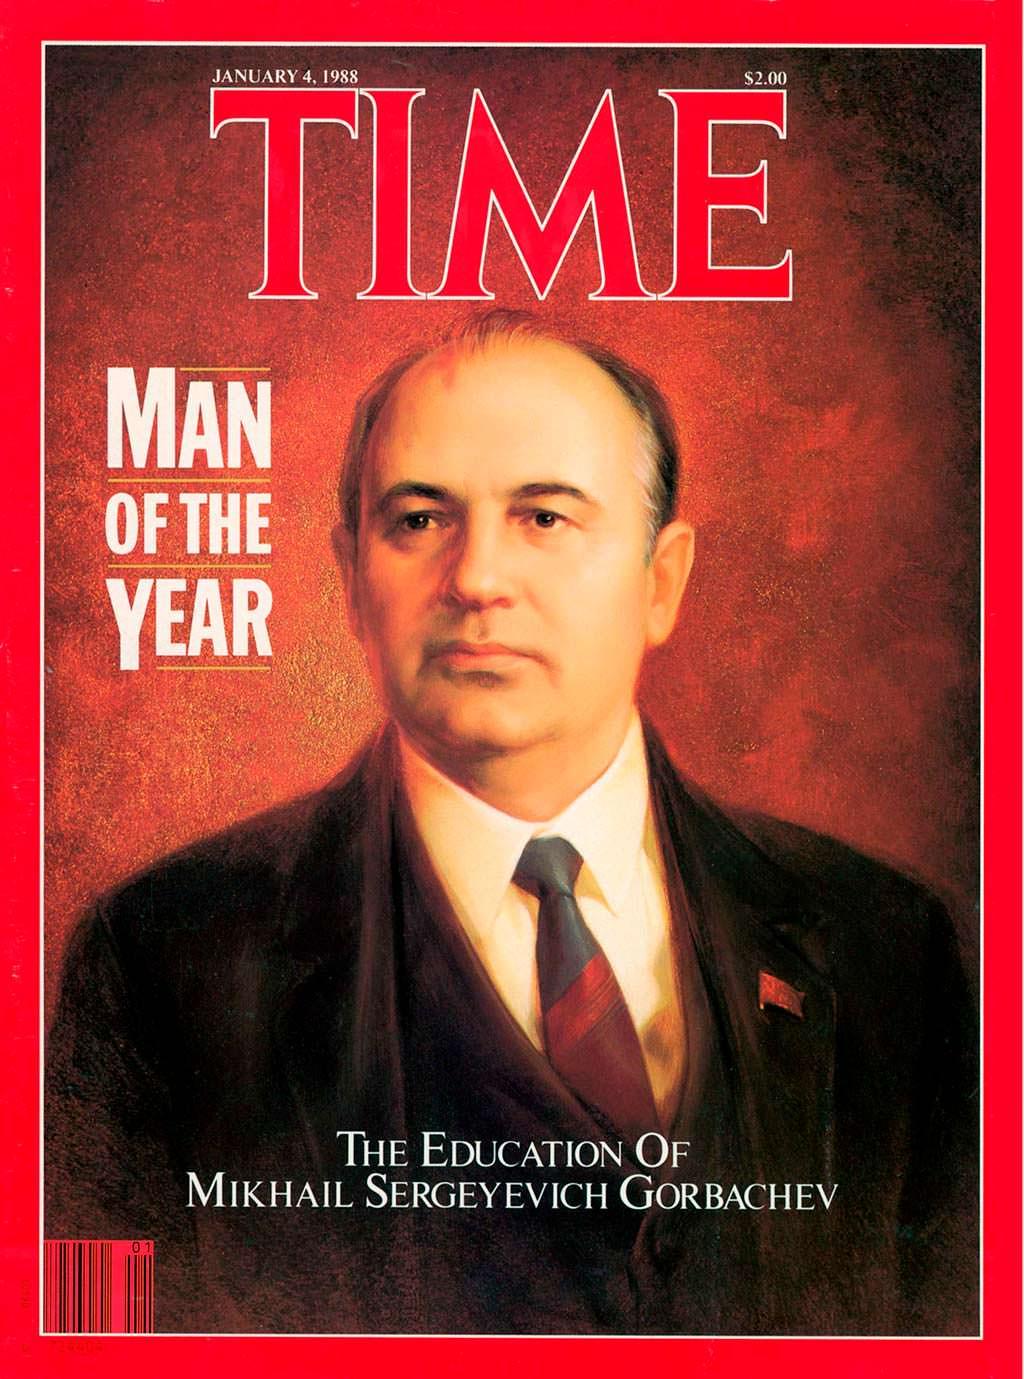 1987 год. Глава ЦК КПСС Михаил Горбачёв на обложке Time